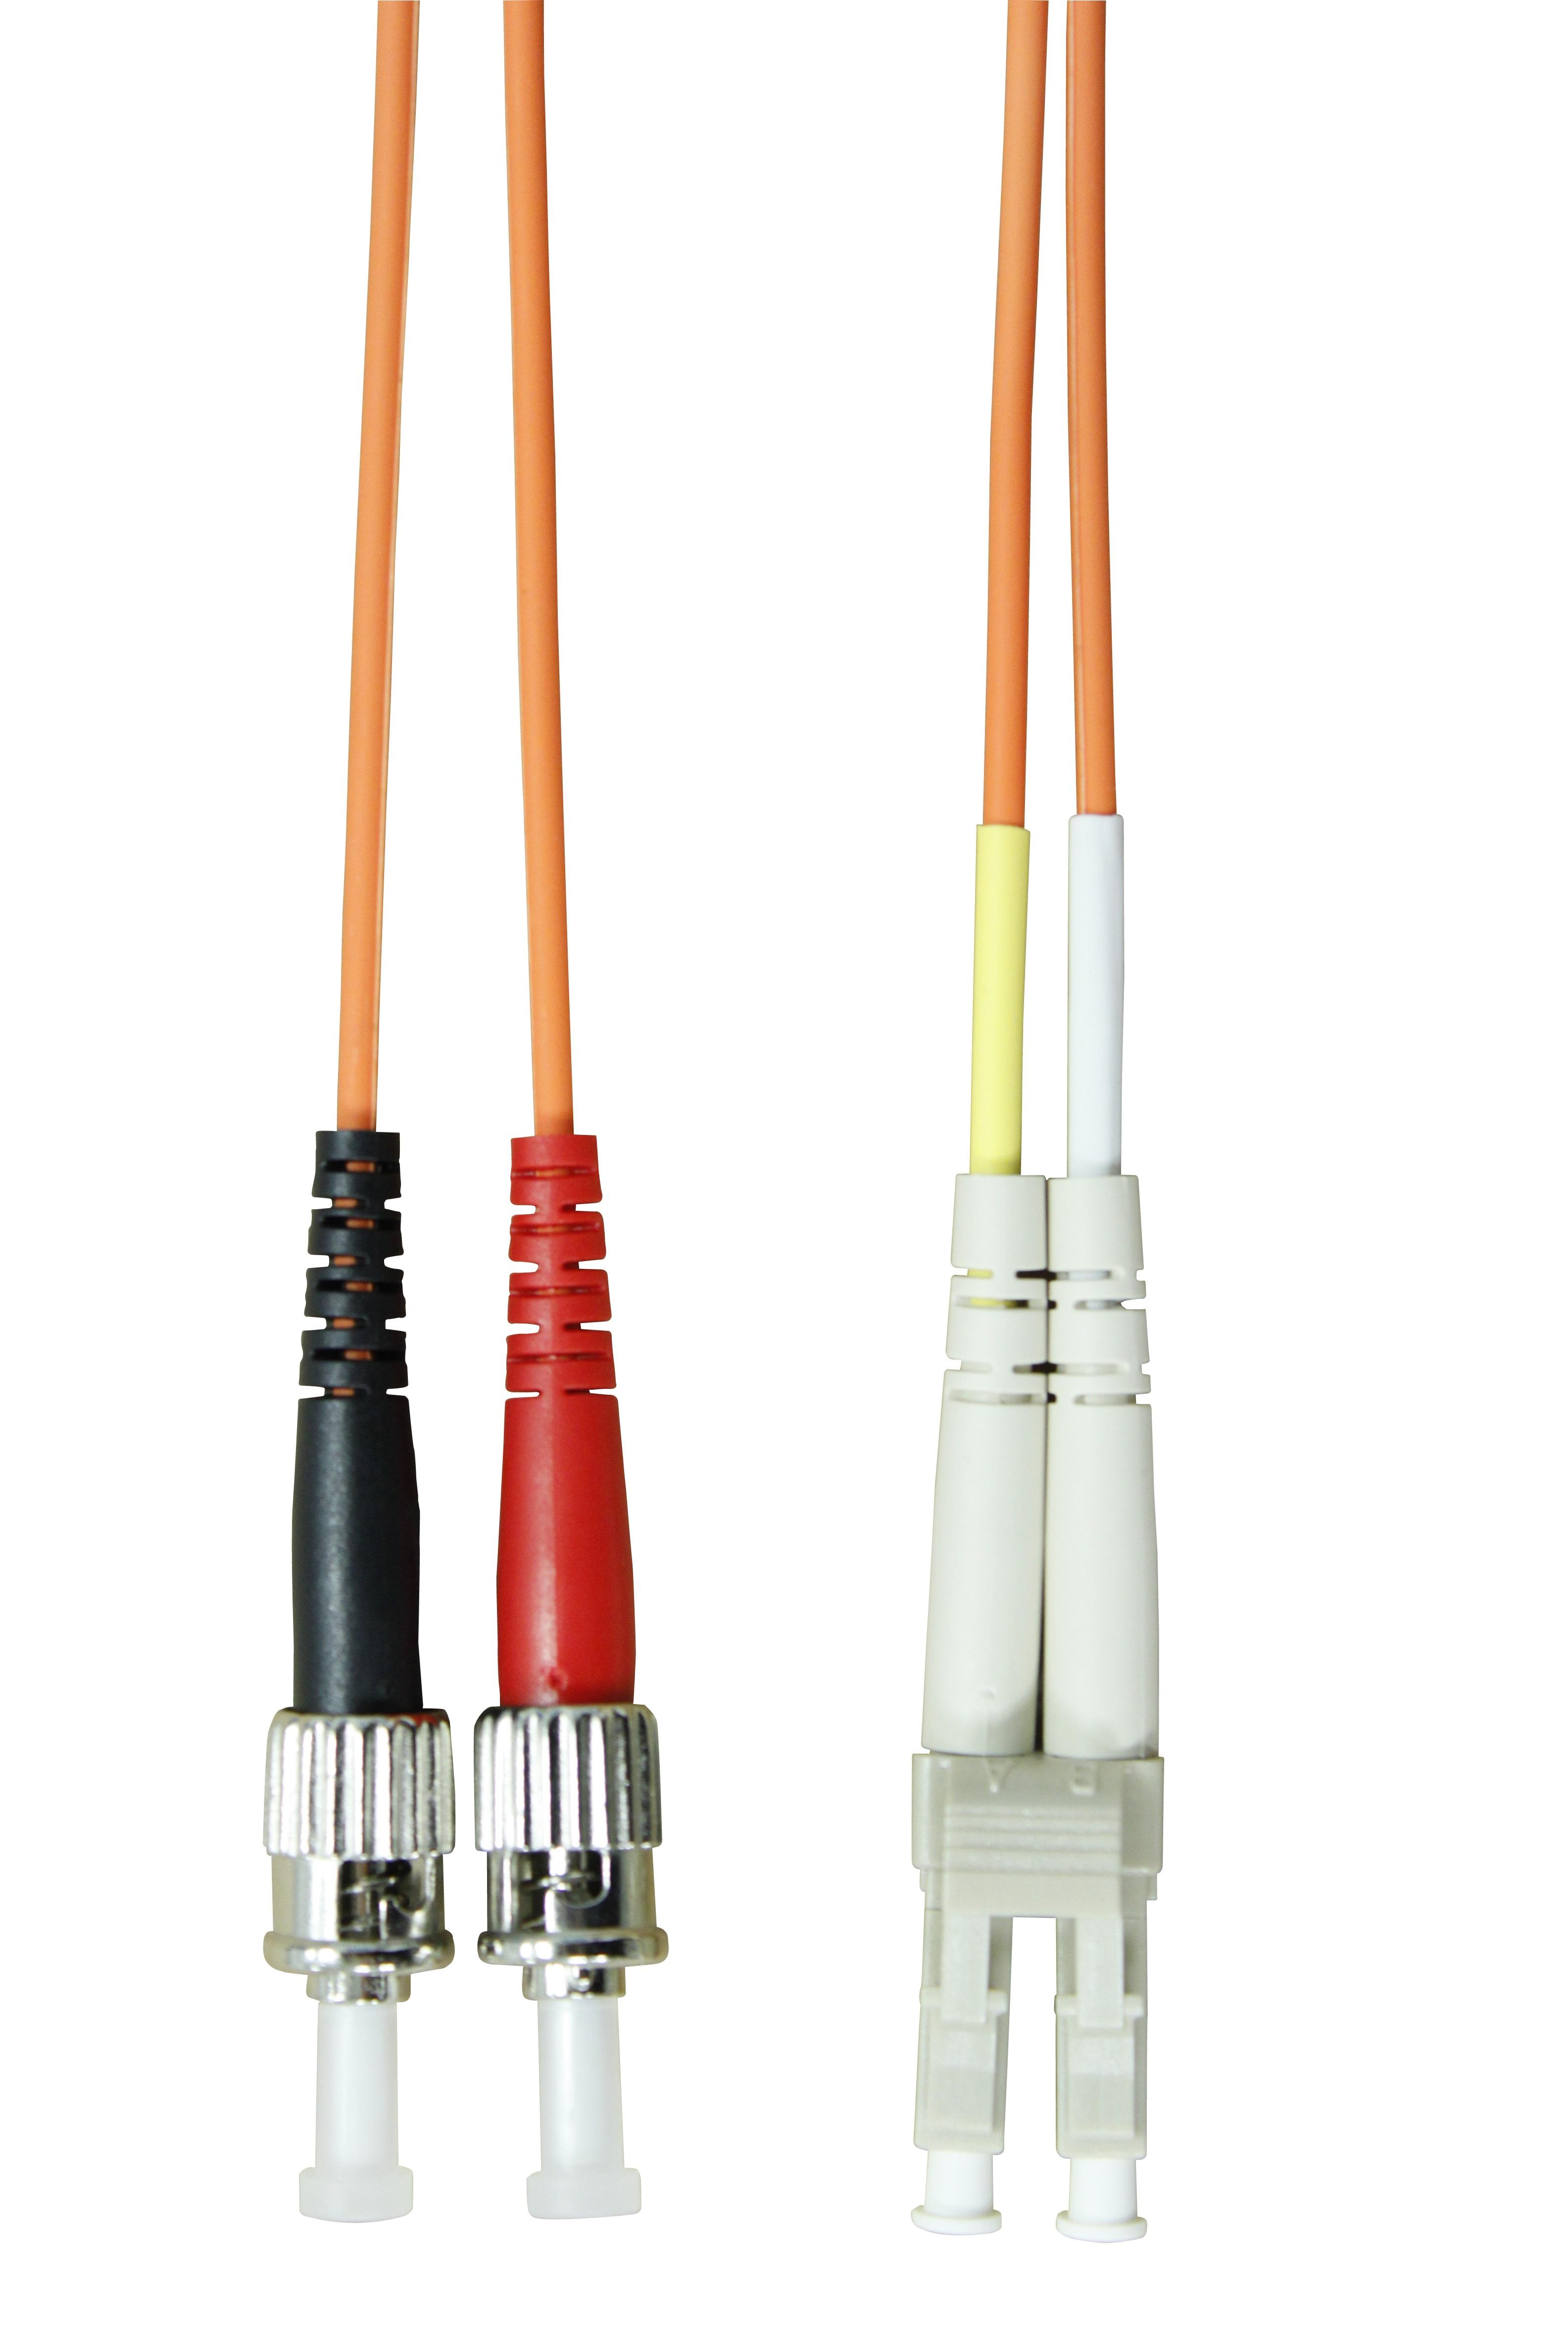 1 Stk LWL Patchkabel Duplex LC / ST,50/125µm OM2,LS0H-3,orange, 2m HLP25LT02F